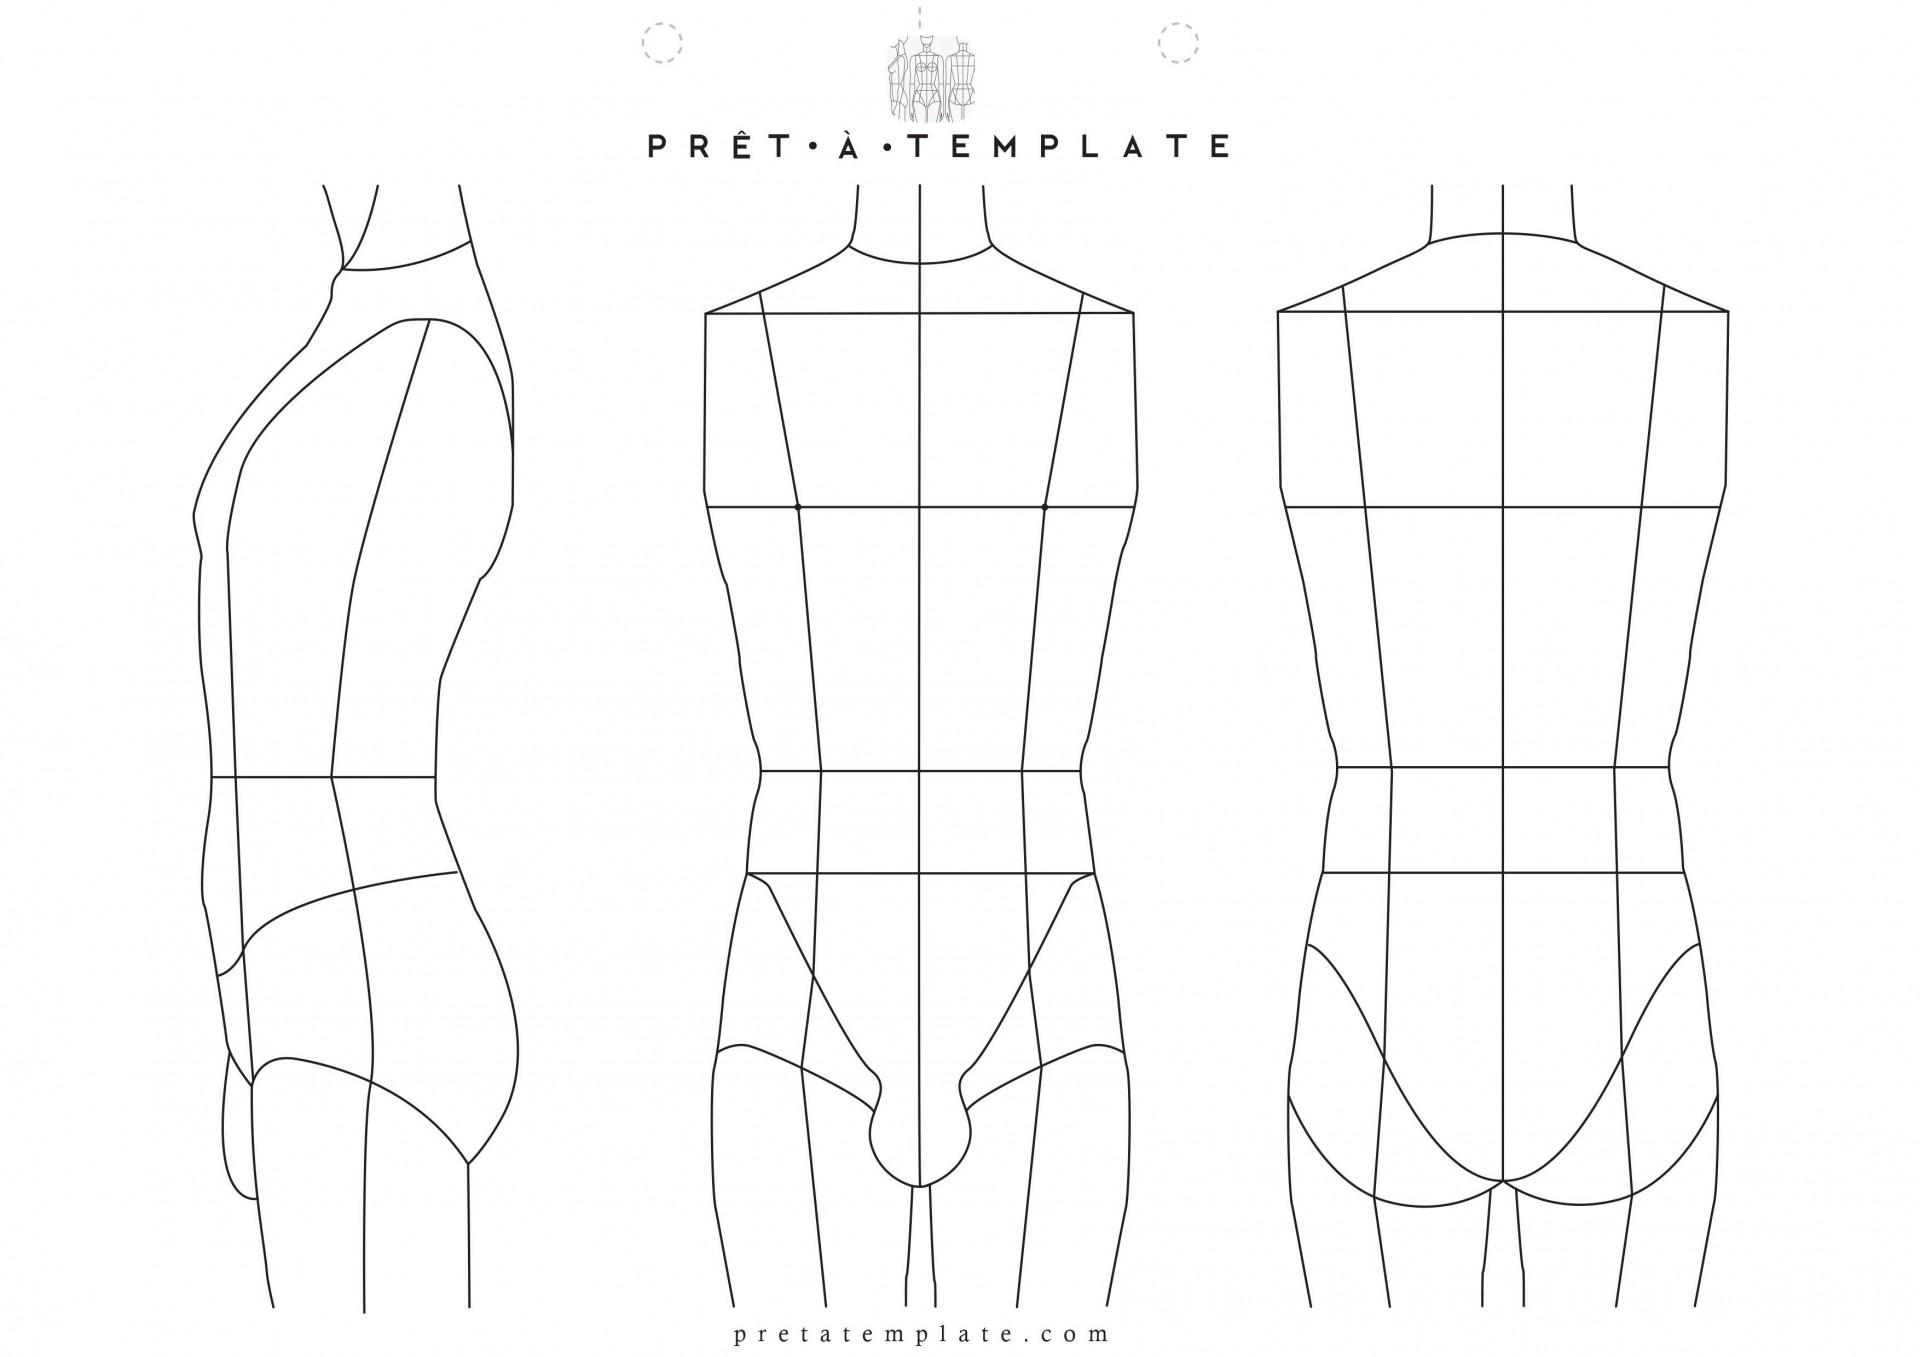 Fashion Design Template To Print Addictionary